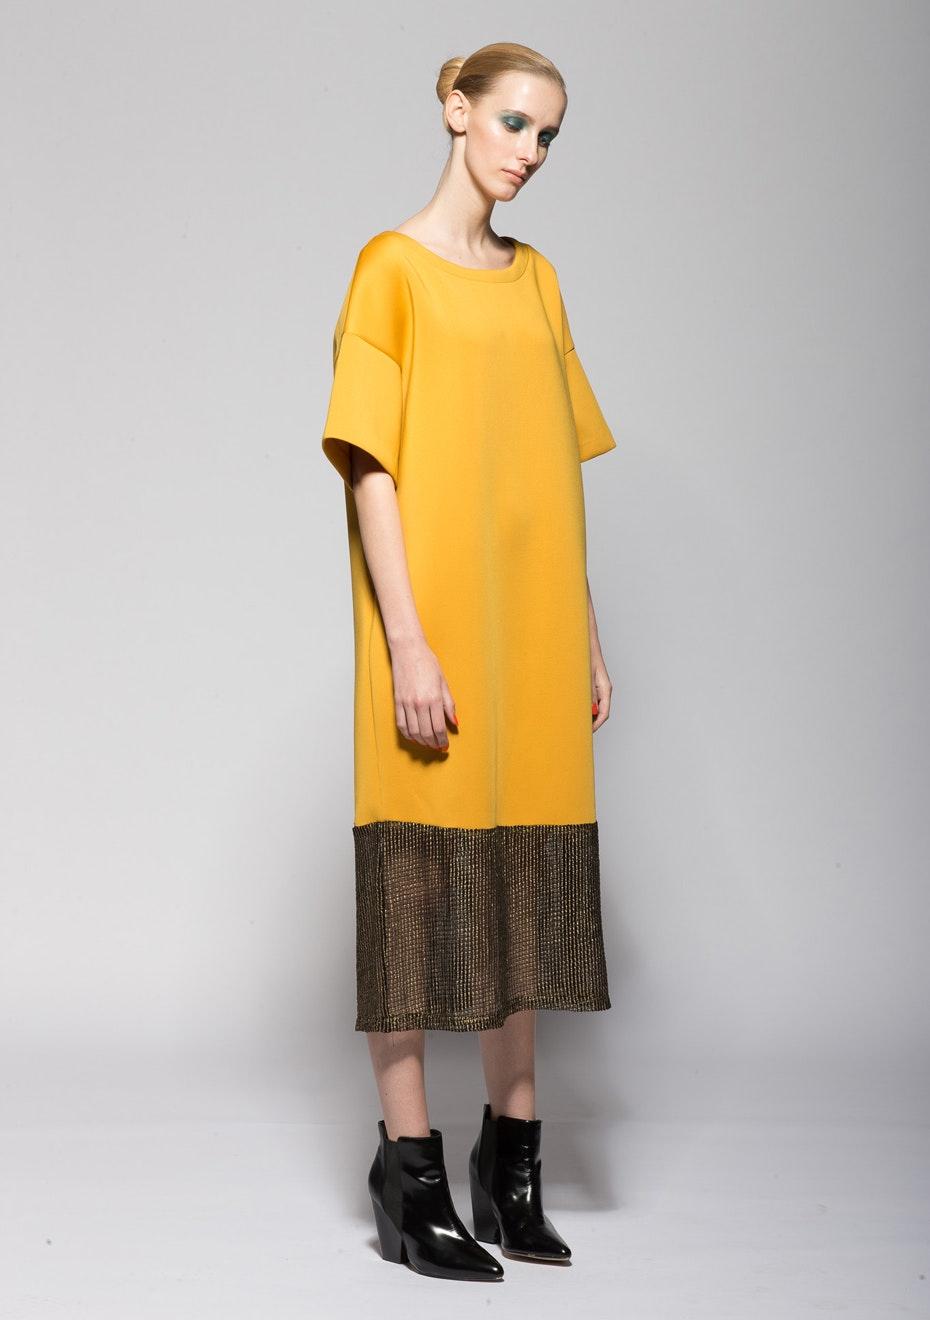 XPLAIN - Scent of Rain Dress - Mustard